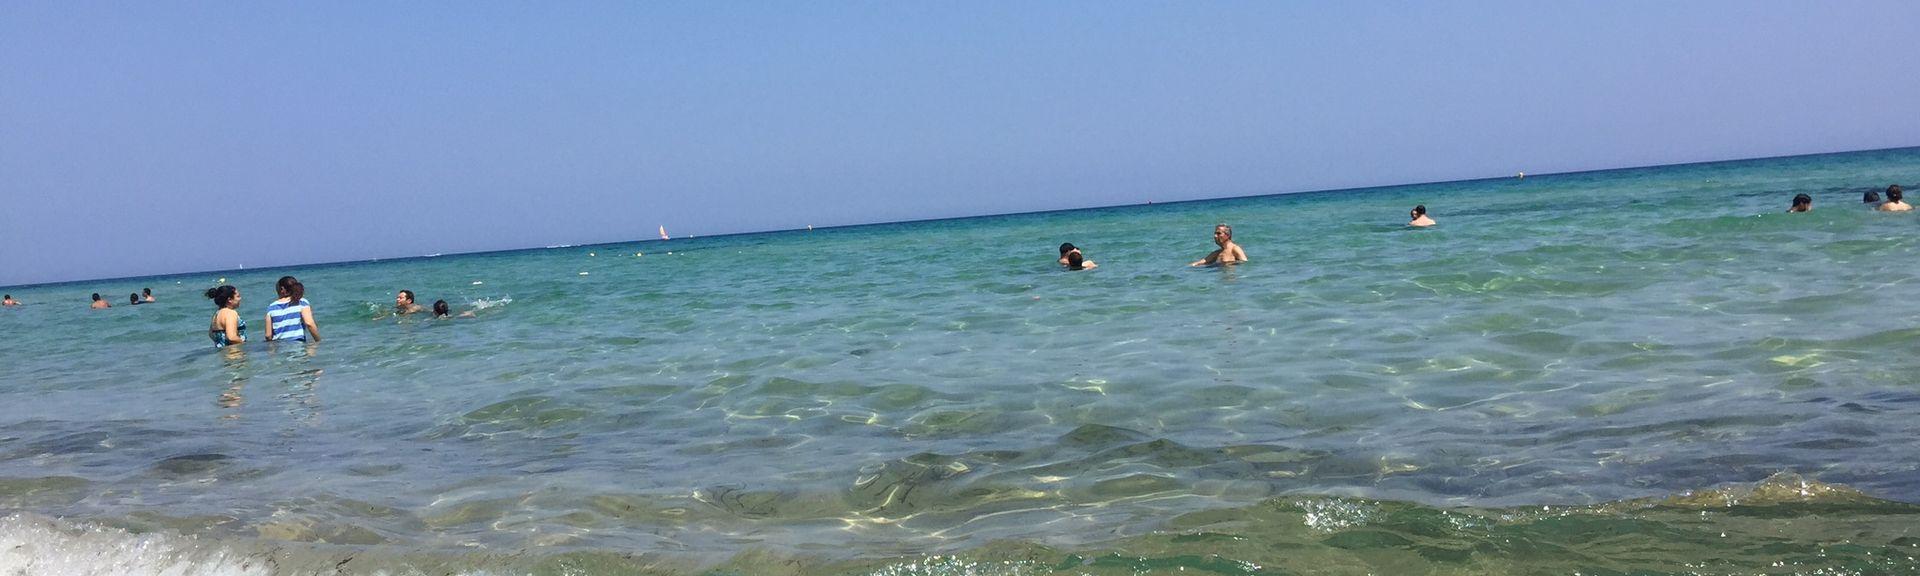 Mrezga, Tunisia